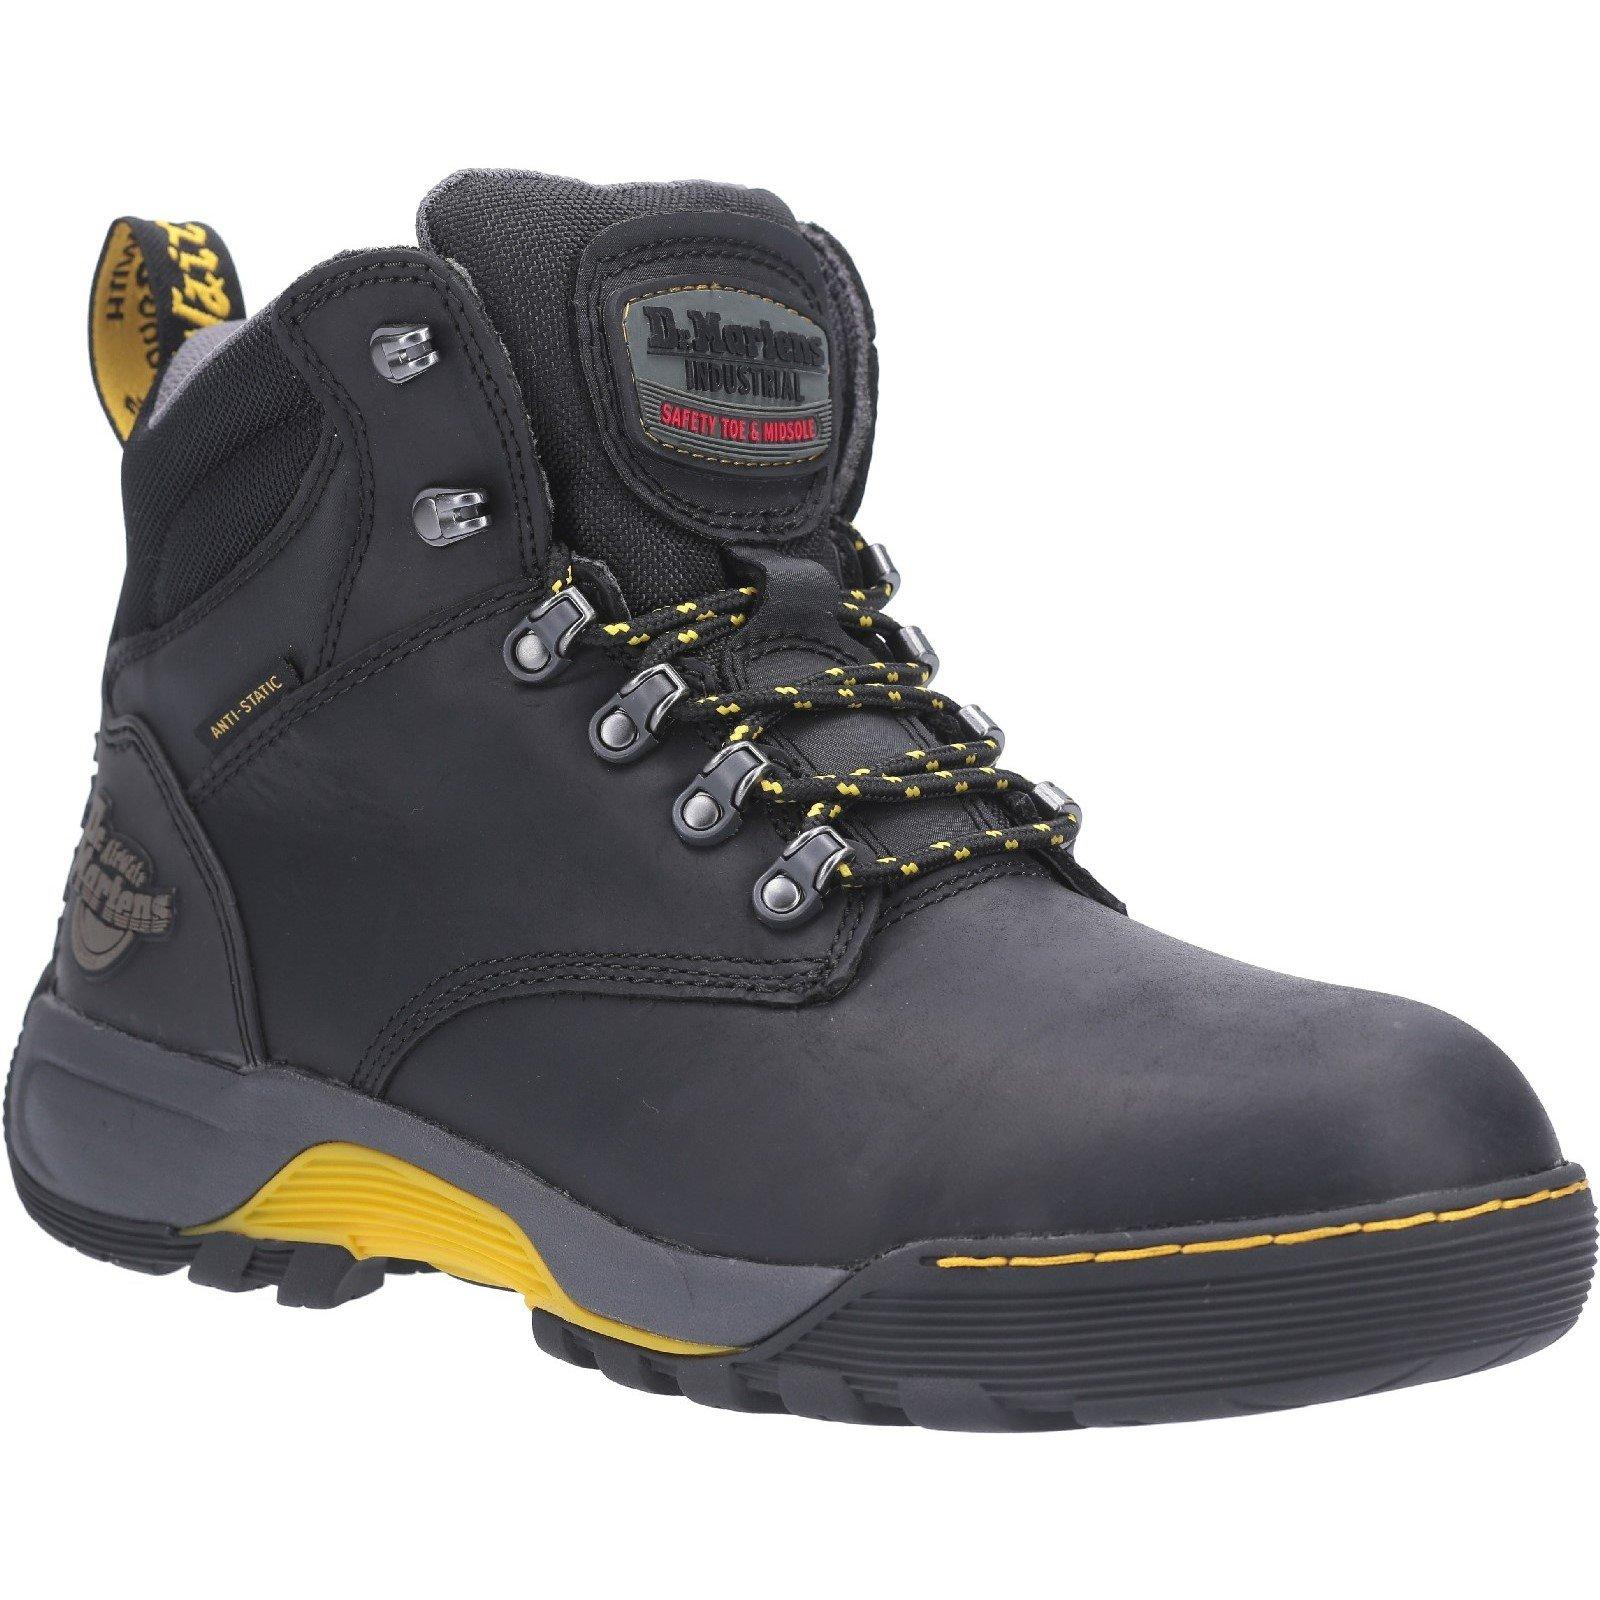 Dr Martens Unisex Ridge ST Lace Up Hiker Safety Boot Black 28324 - Black 10